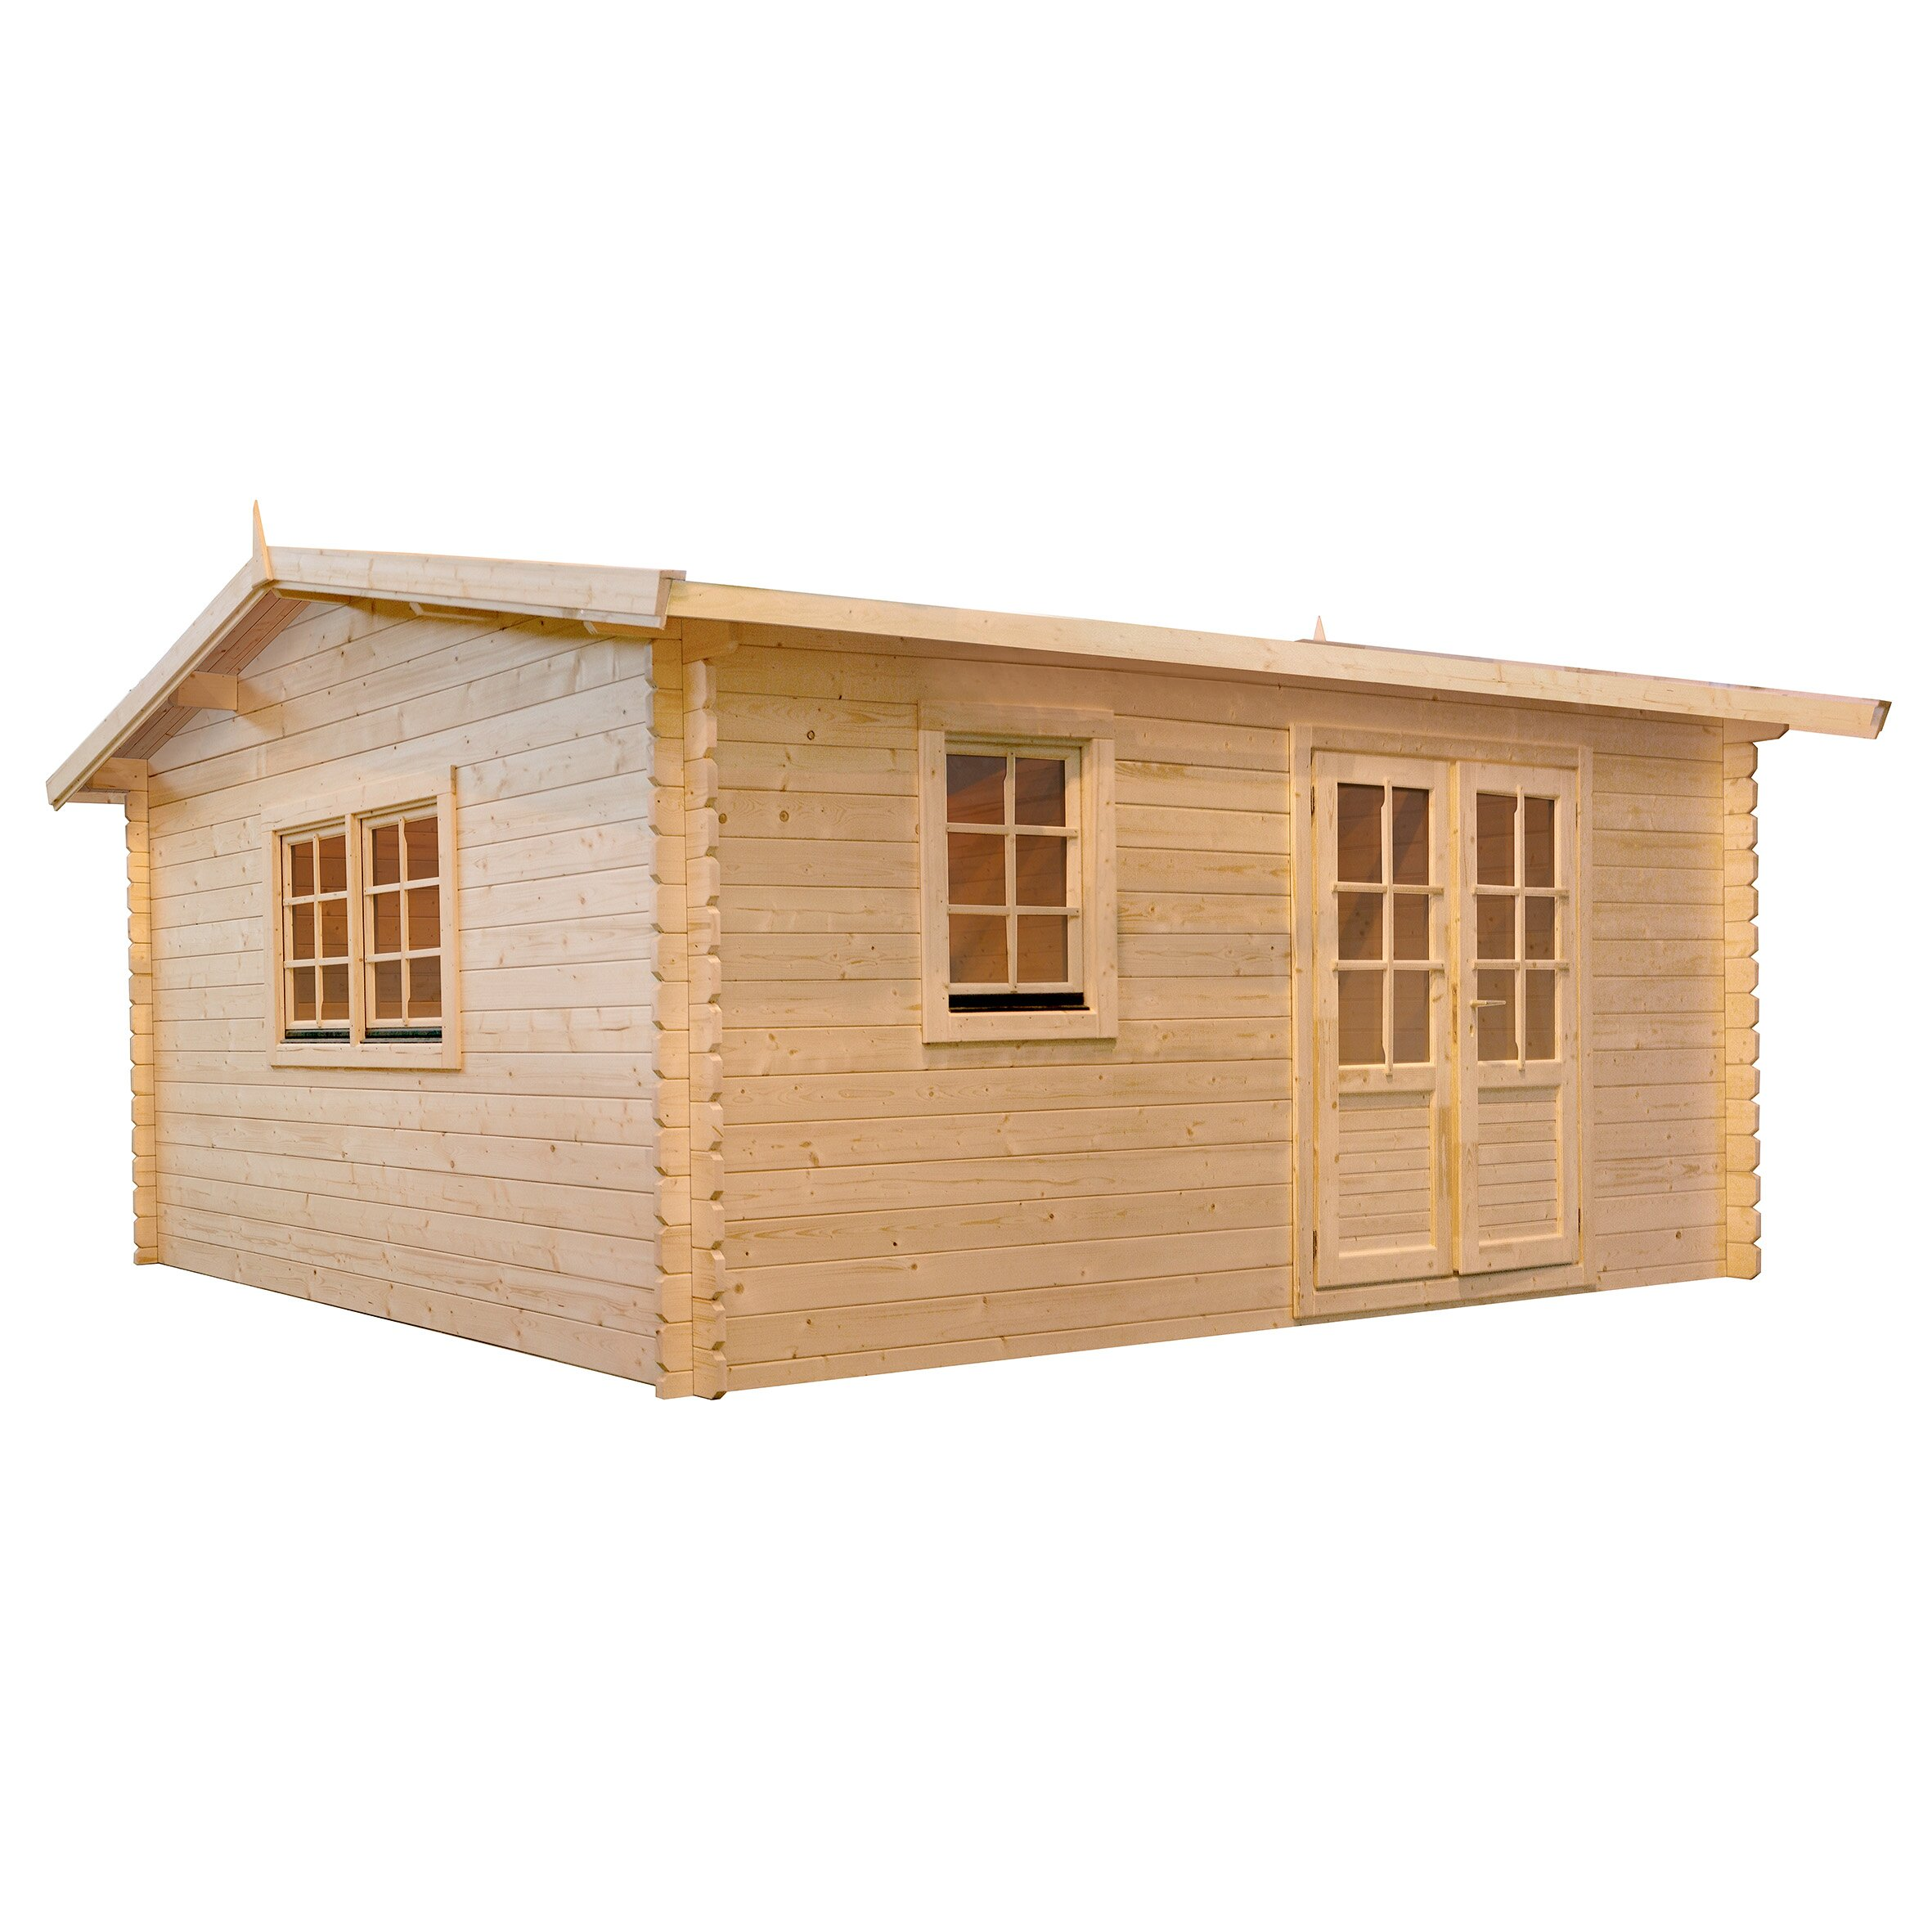 Aspen 12 ft w x 10 ft d solid wood garden shed wayfair for Garden shed 9 x 5